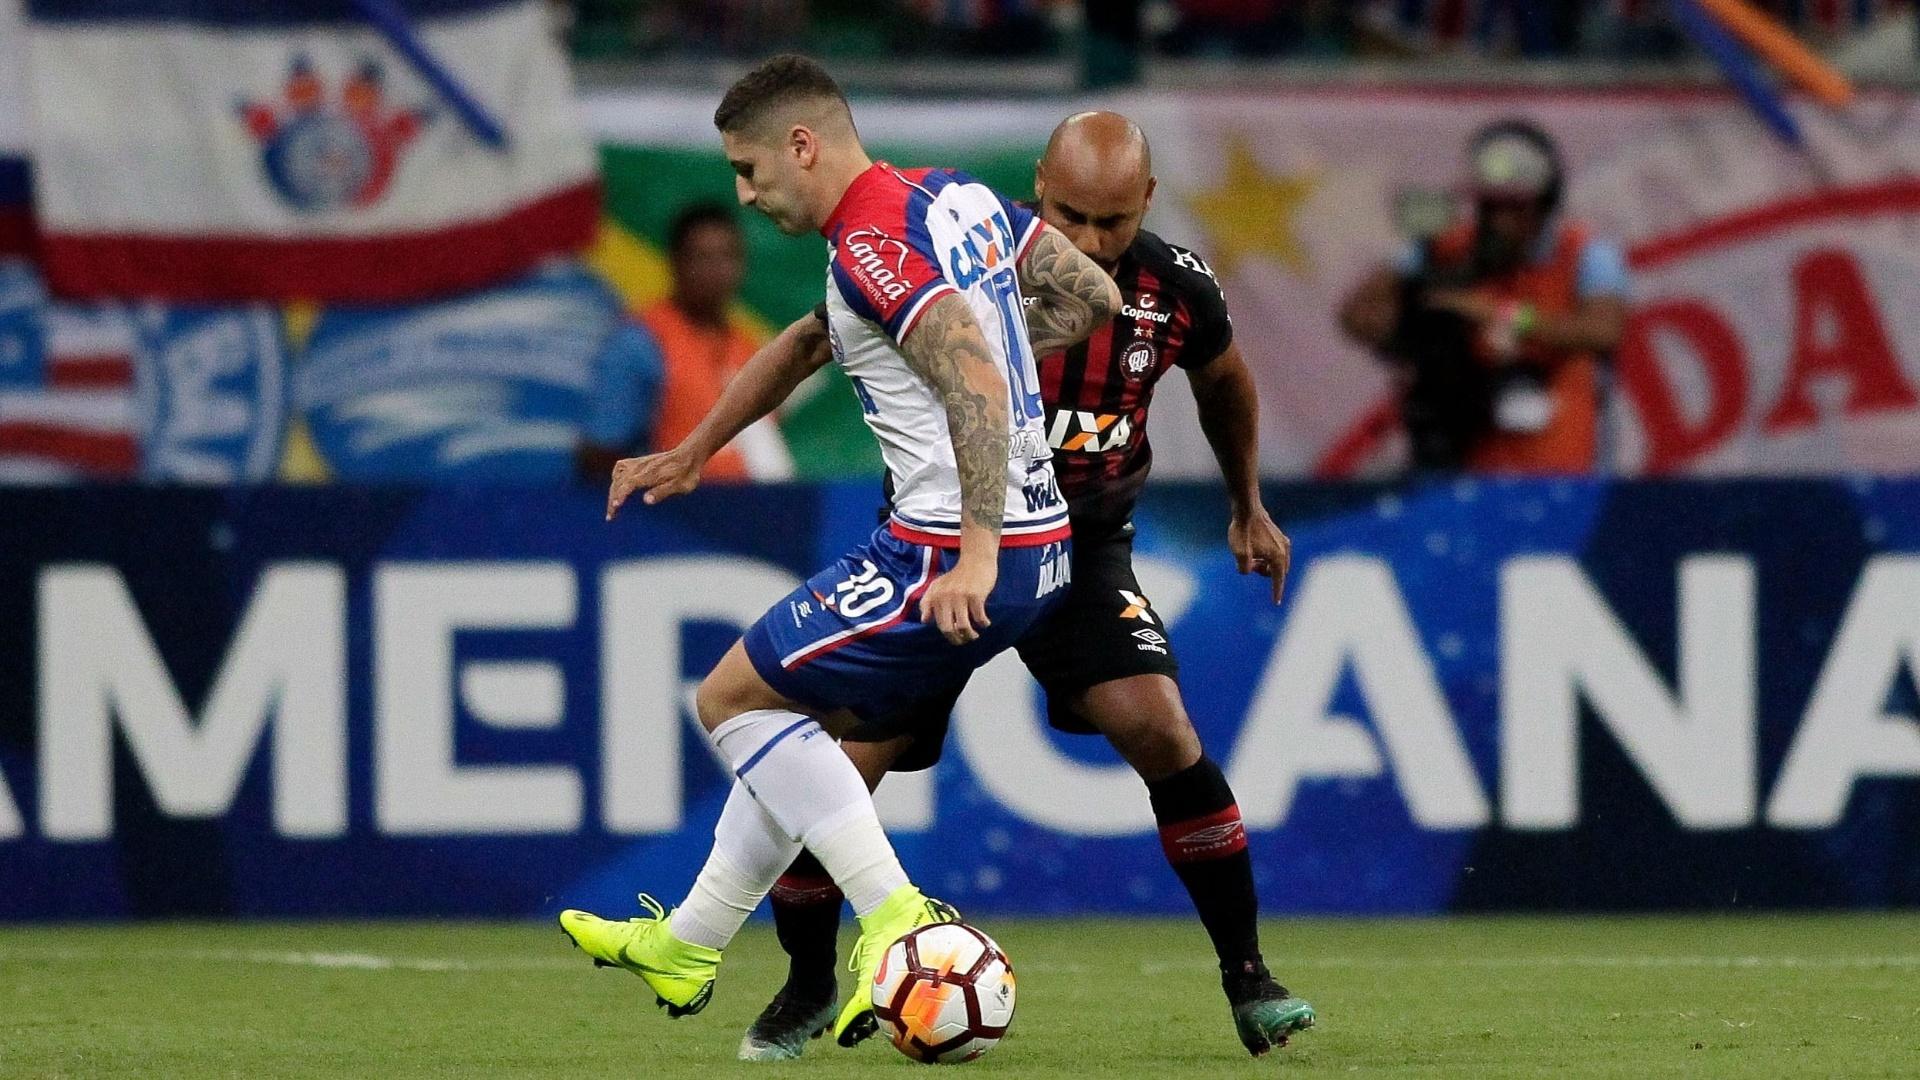 Zé Rafael e Jonathan disputam bola durante Bahia x Atlético-PR